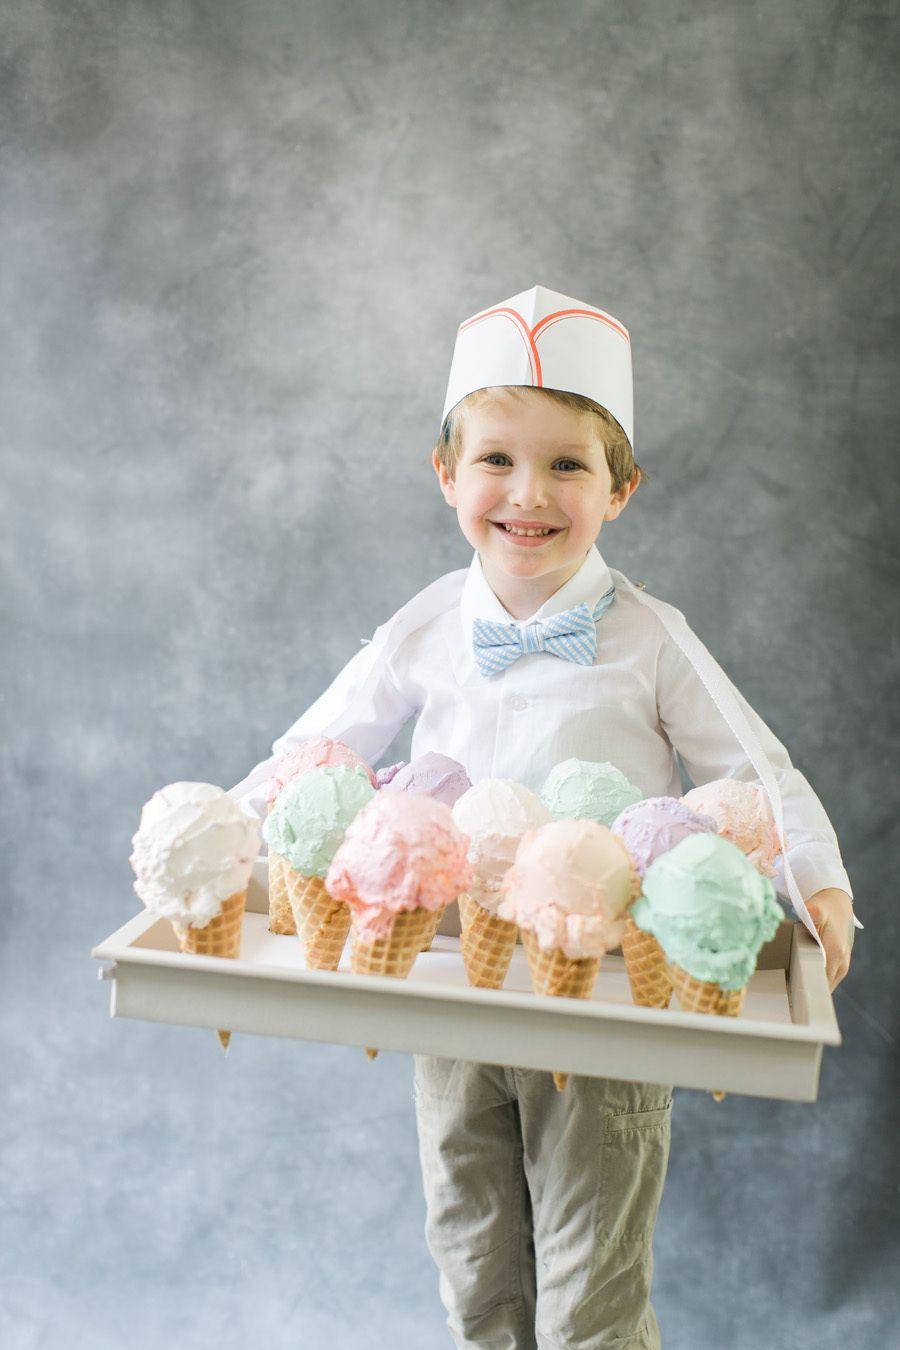 DIY Halloween Costume: Ice Cream Man | Men photography ...  DIY Halloween C...